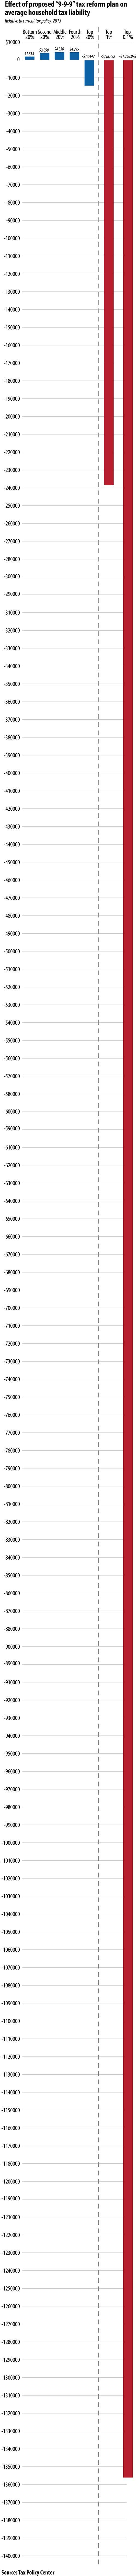 Average-tax-change-from-9-9-9-plan-10-18-2011-OPT.jpg